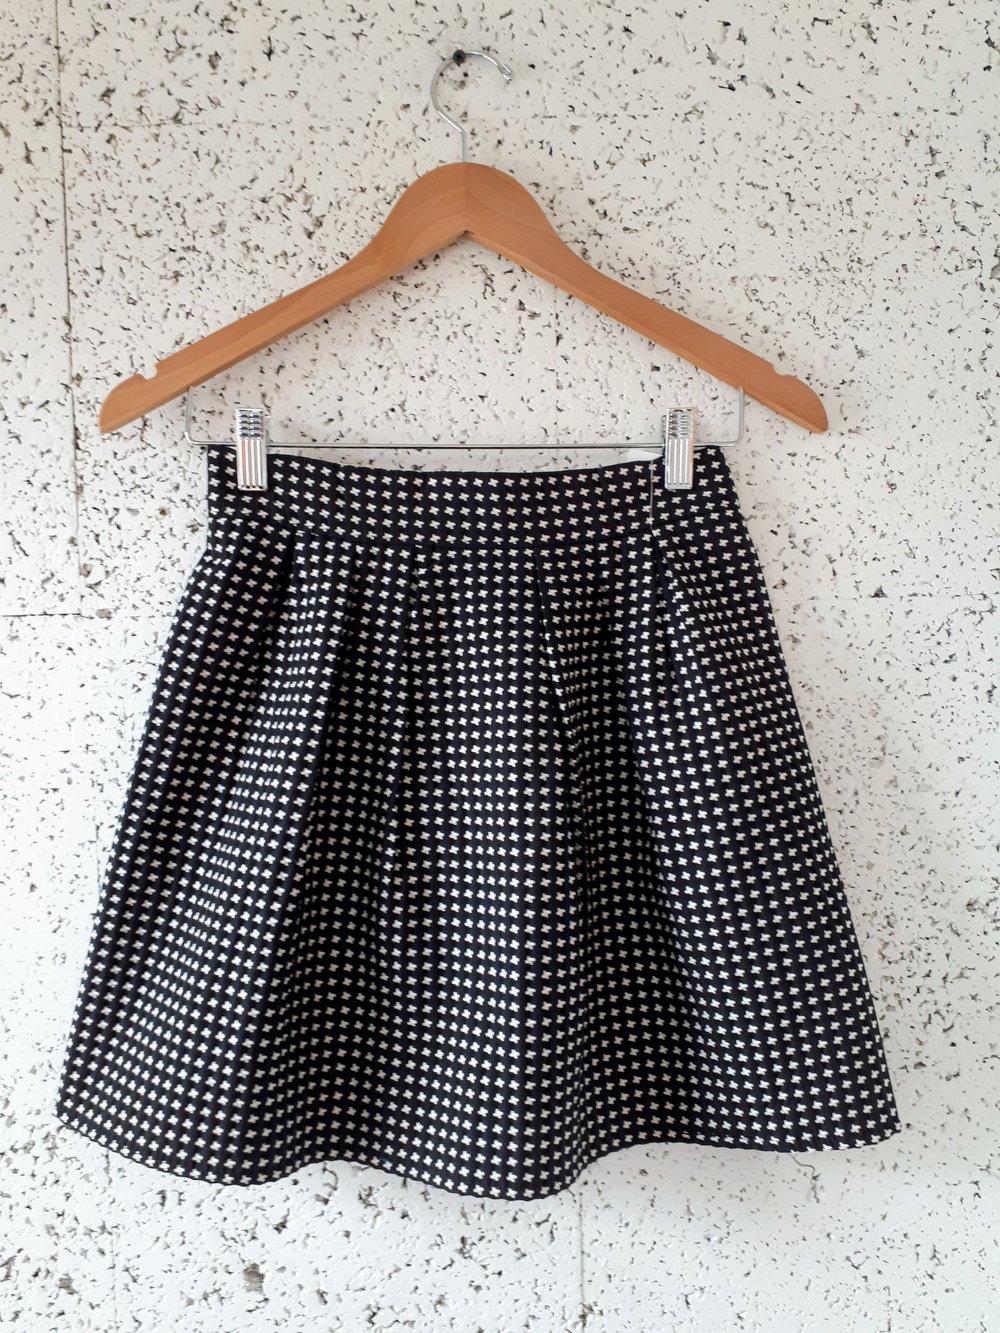 Loft 82 skirt; Size S, $30